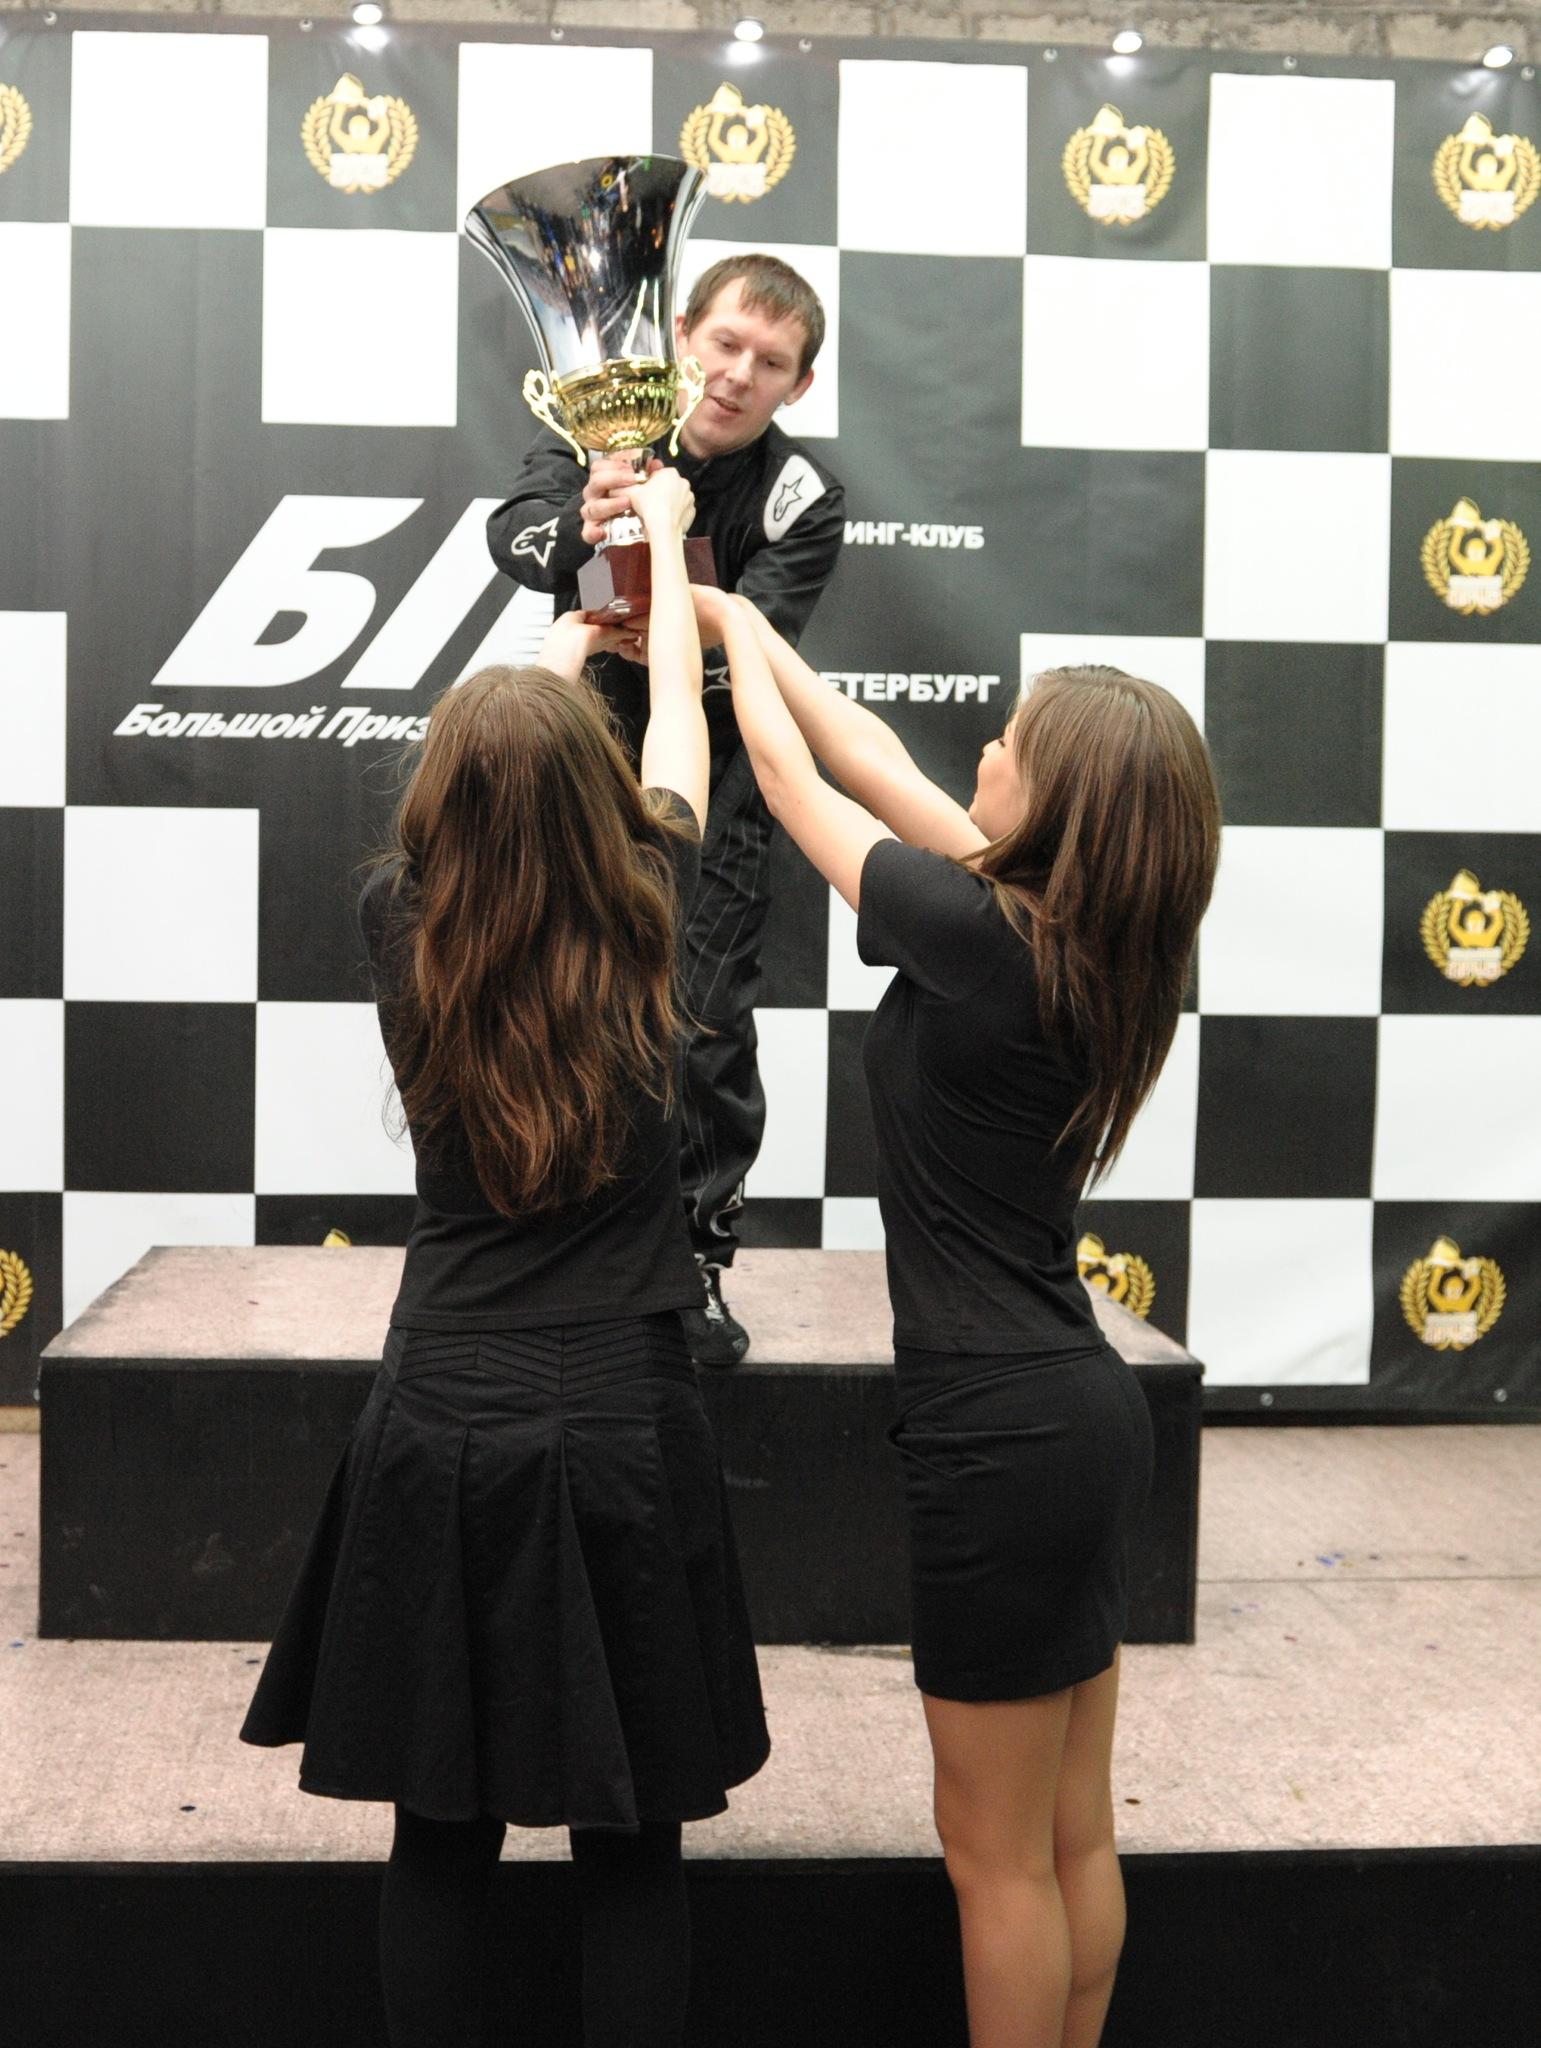 Евгений - Чемпион 2011